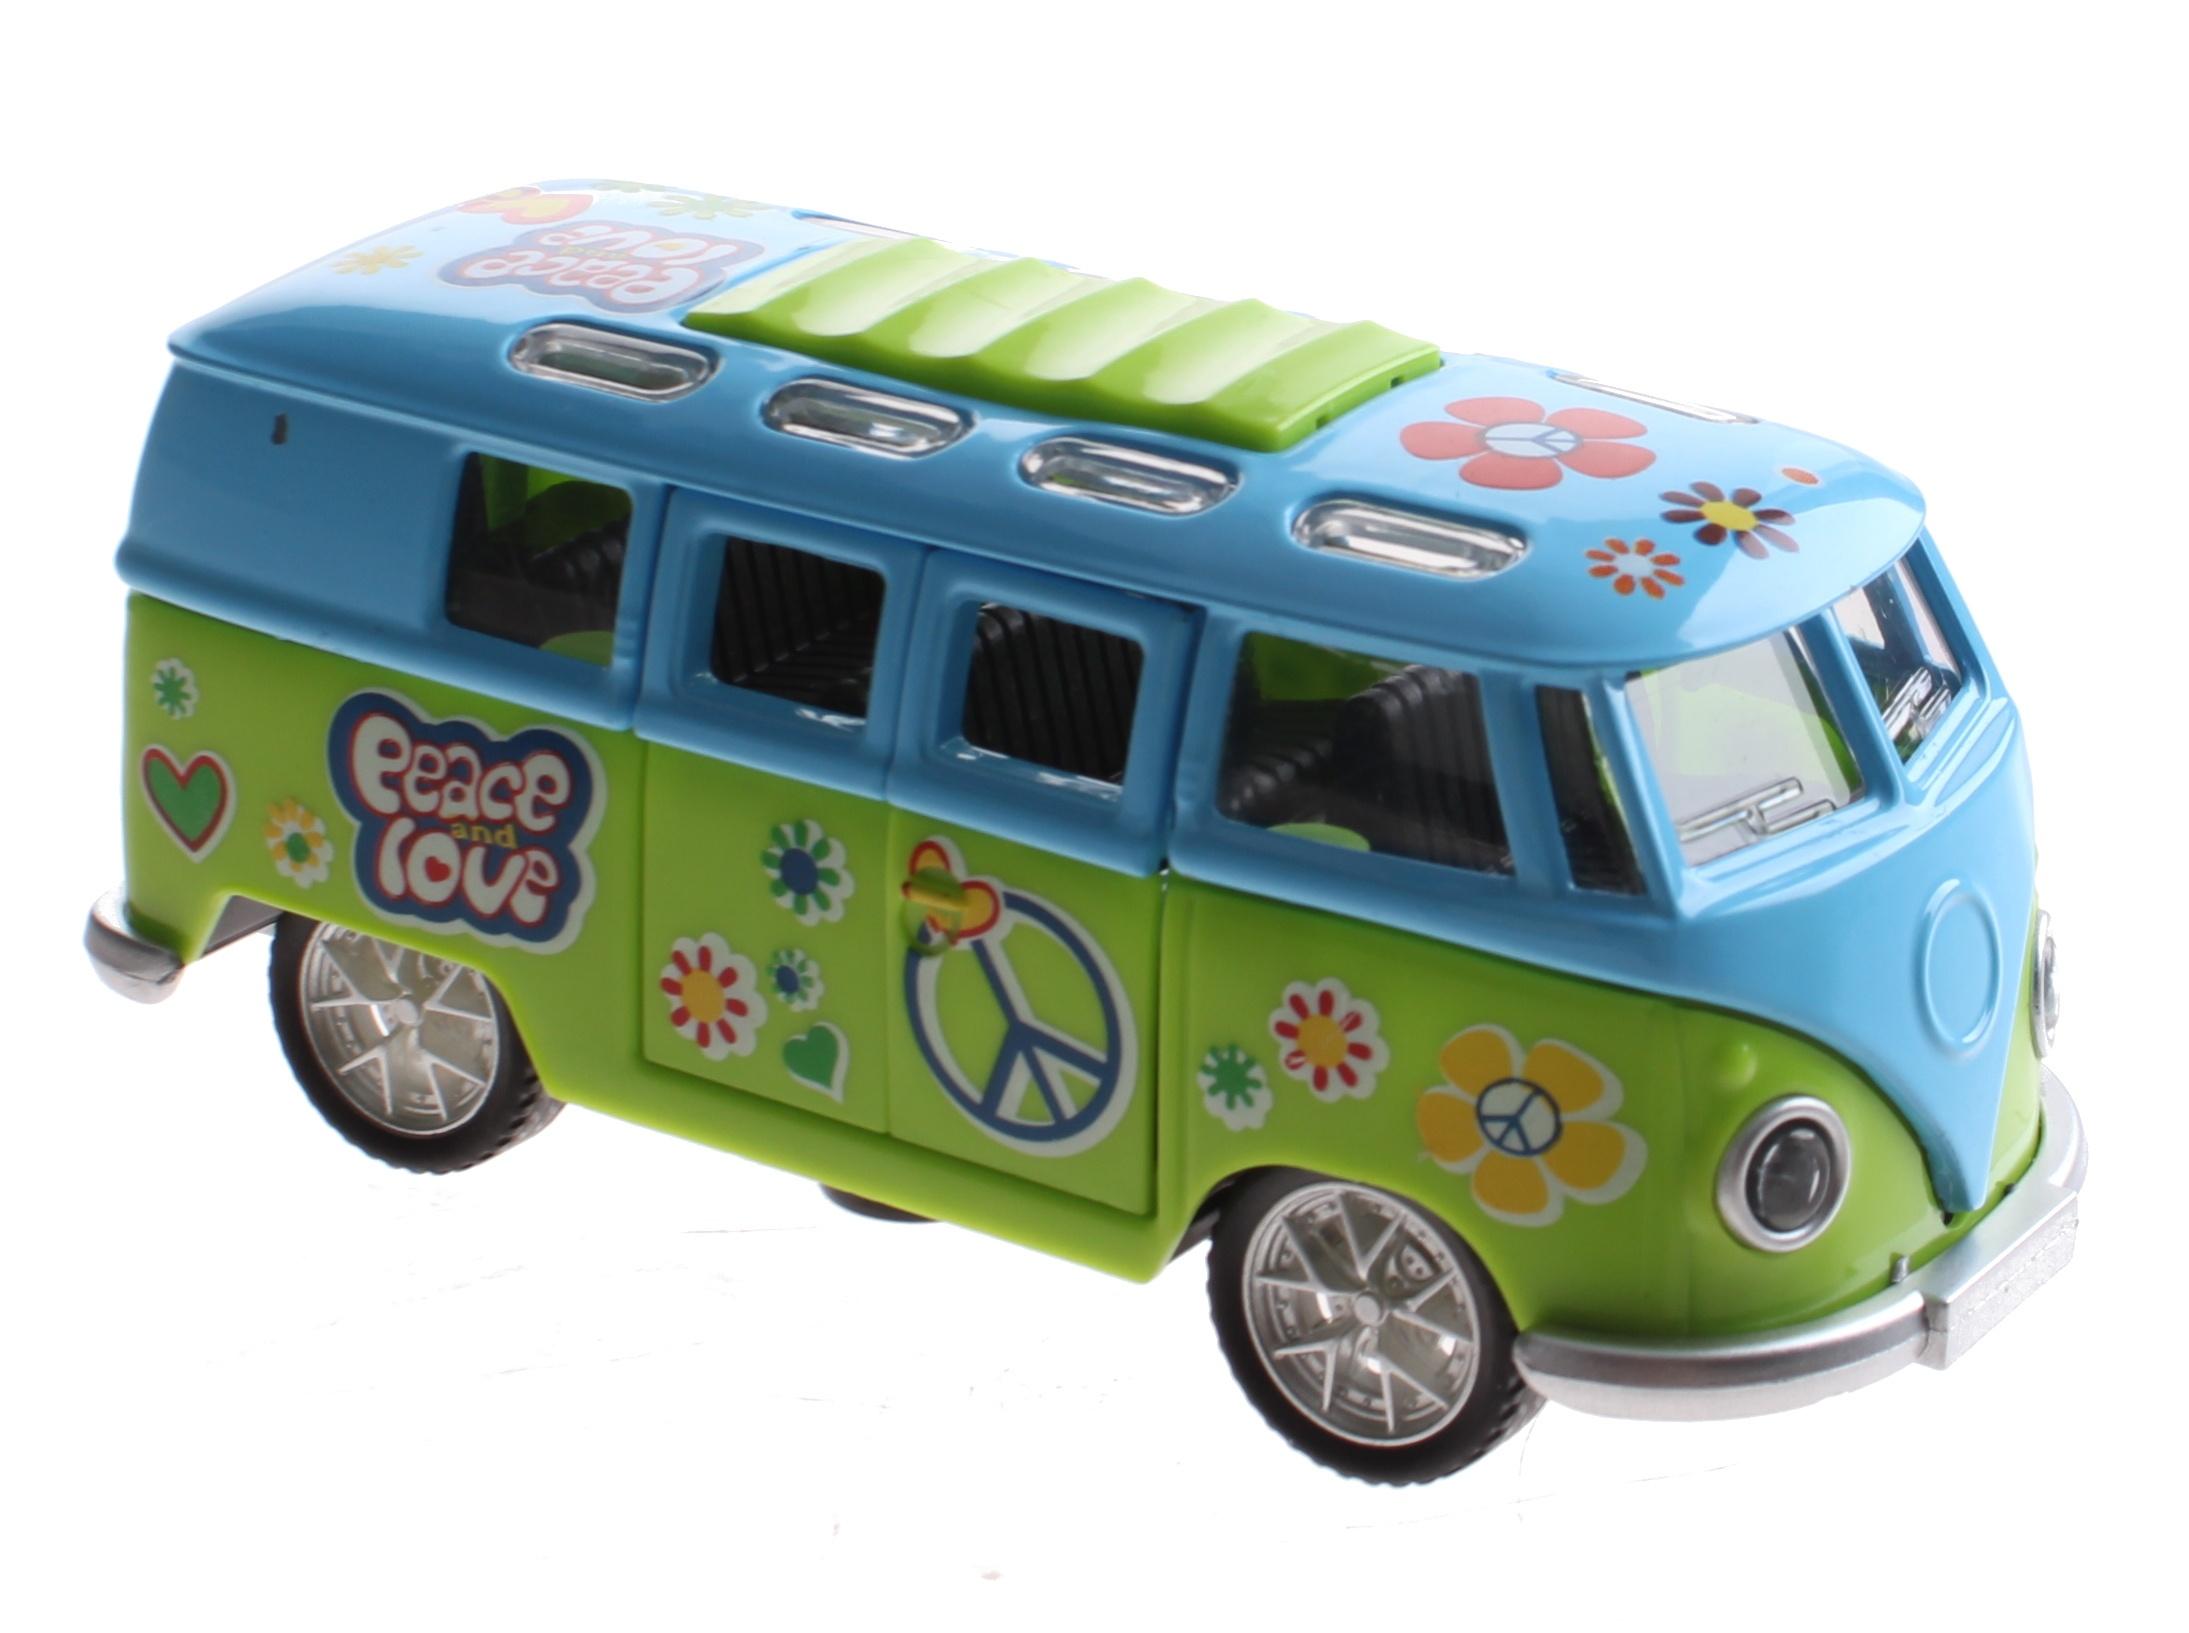 651e0979f9c Toi-Toys FlowerPower Die-cast bus green   blue - Internet-Toys